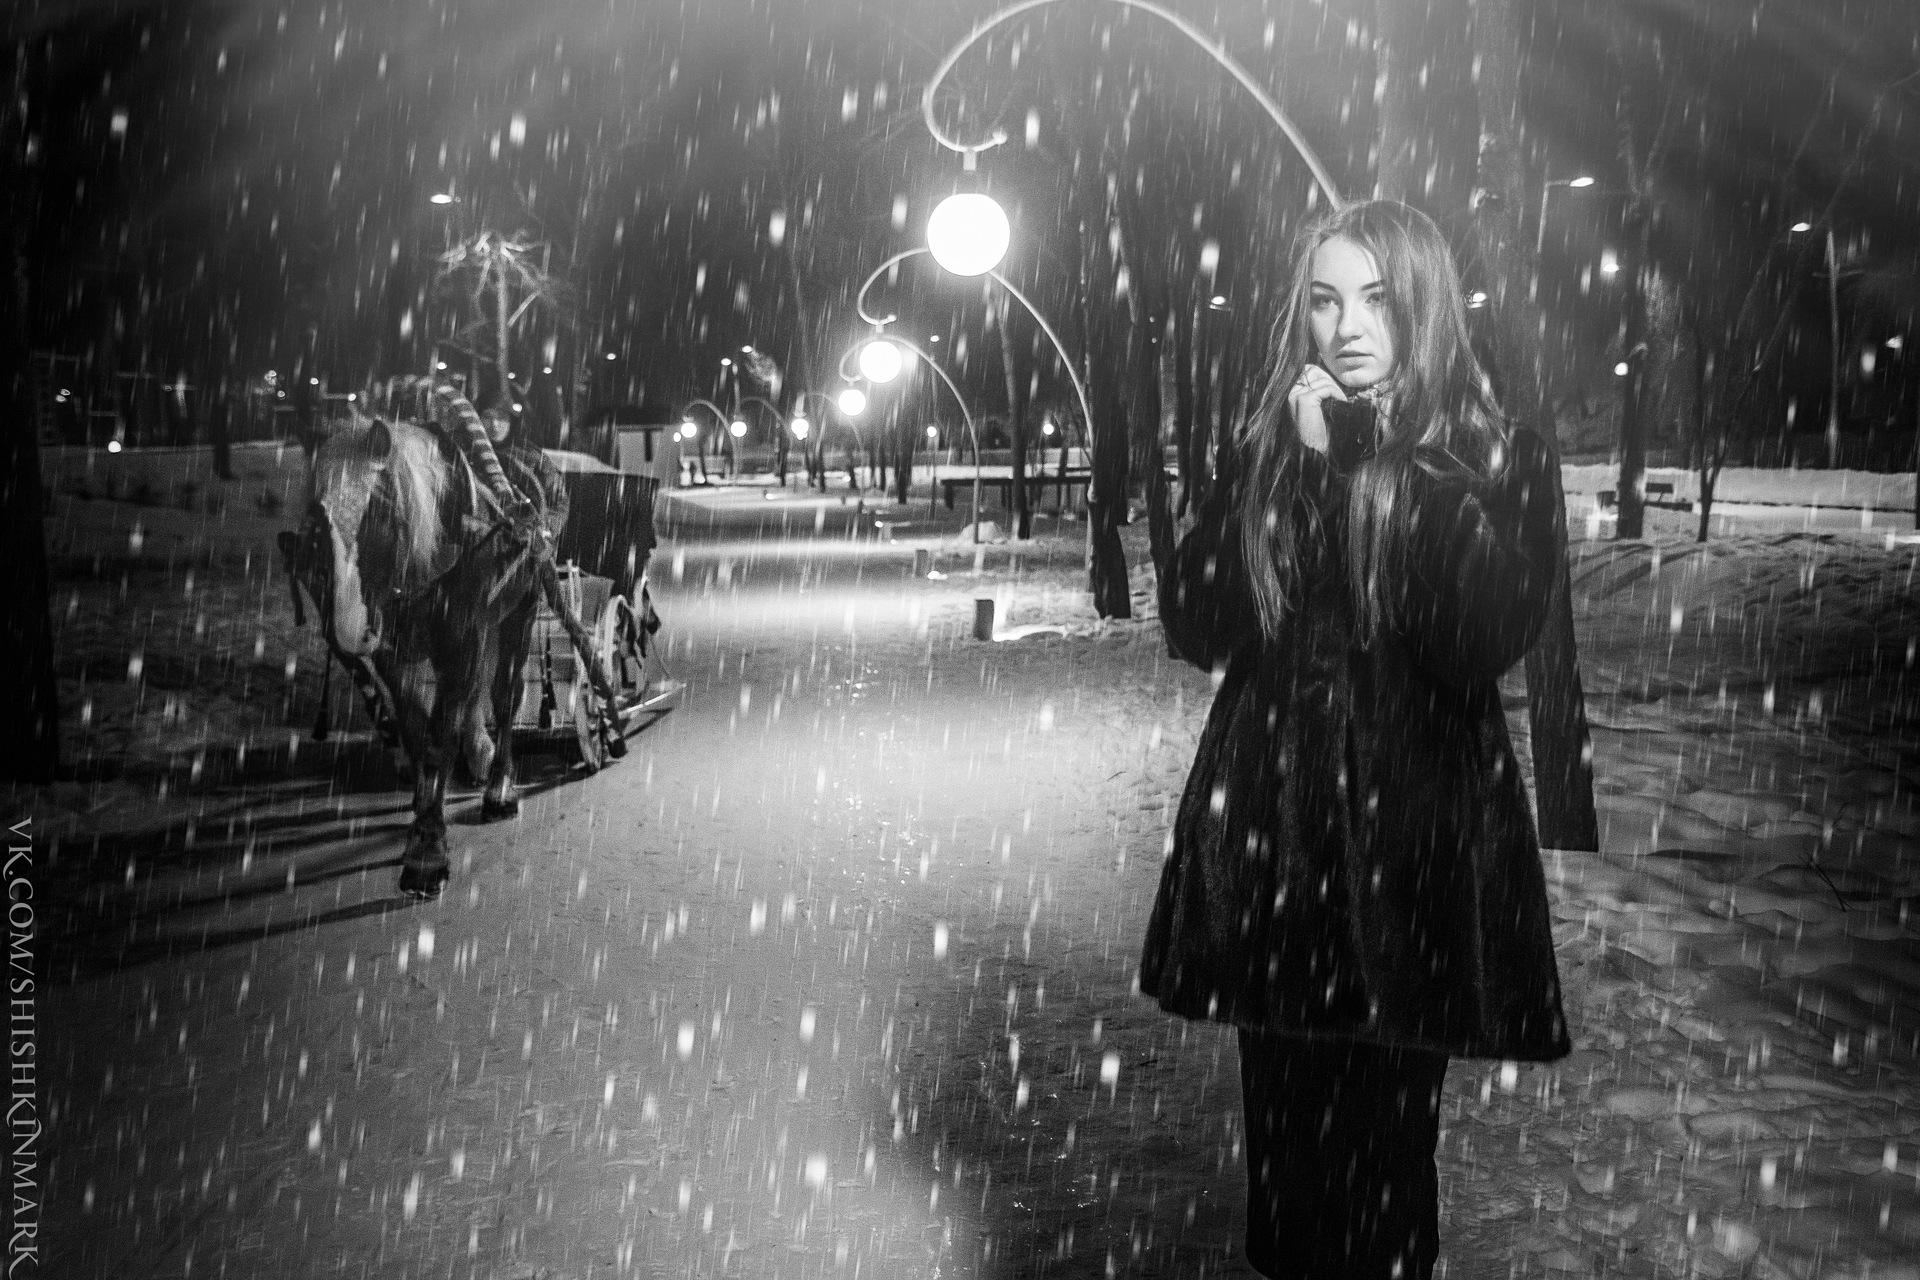 Cold story by Mark Shishkin